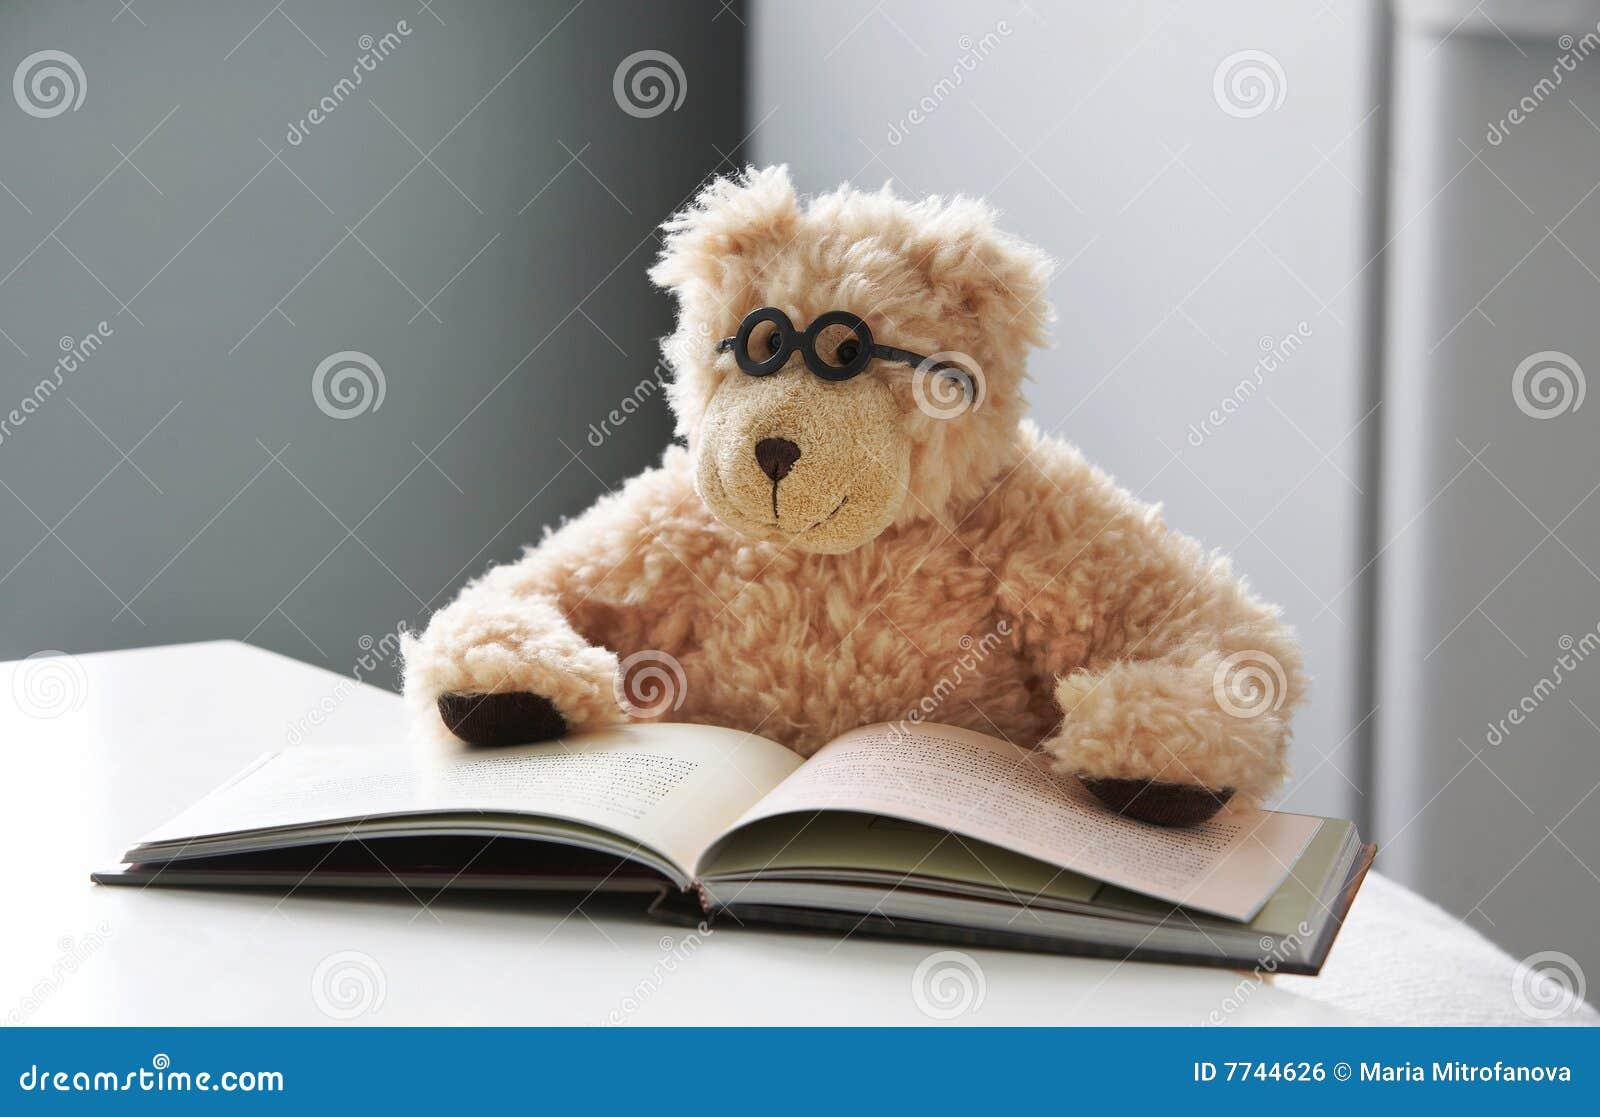 медведь 08